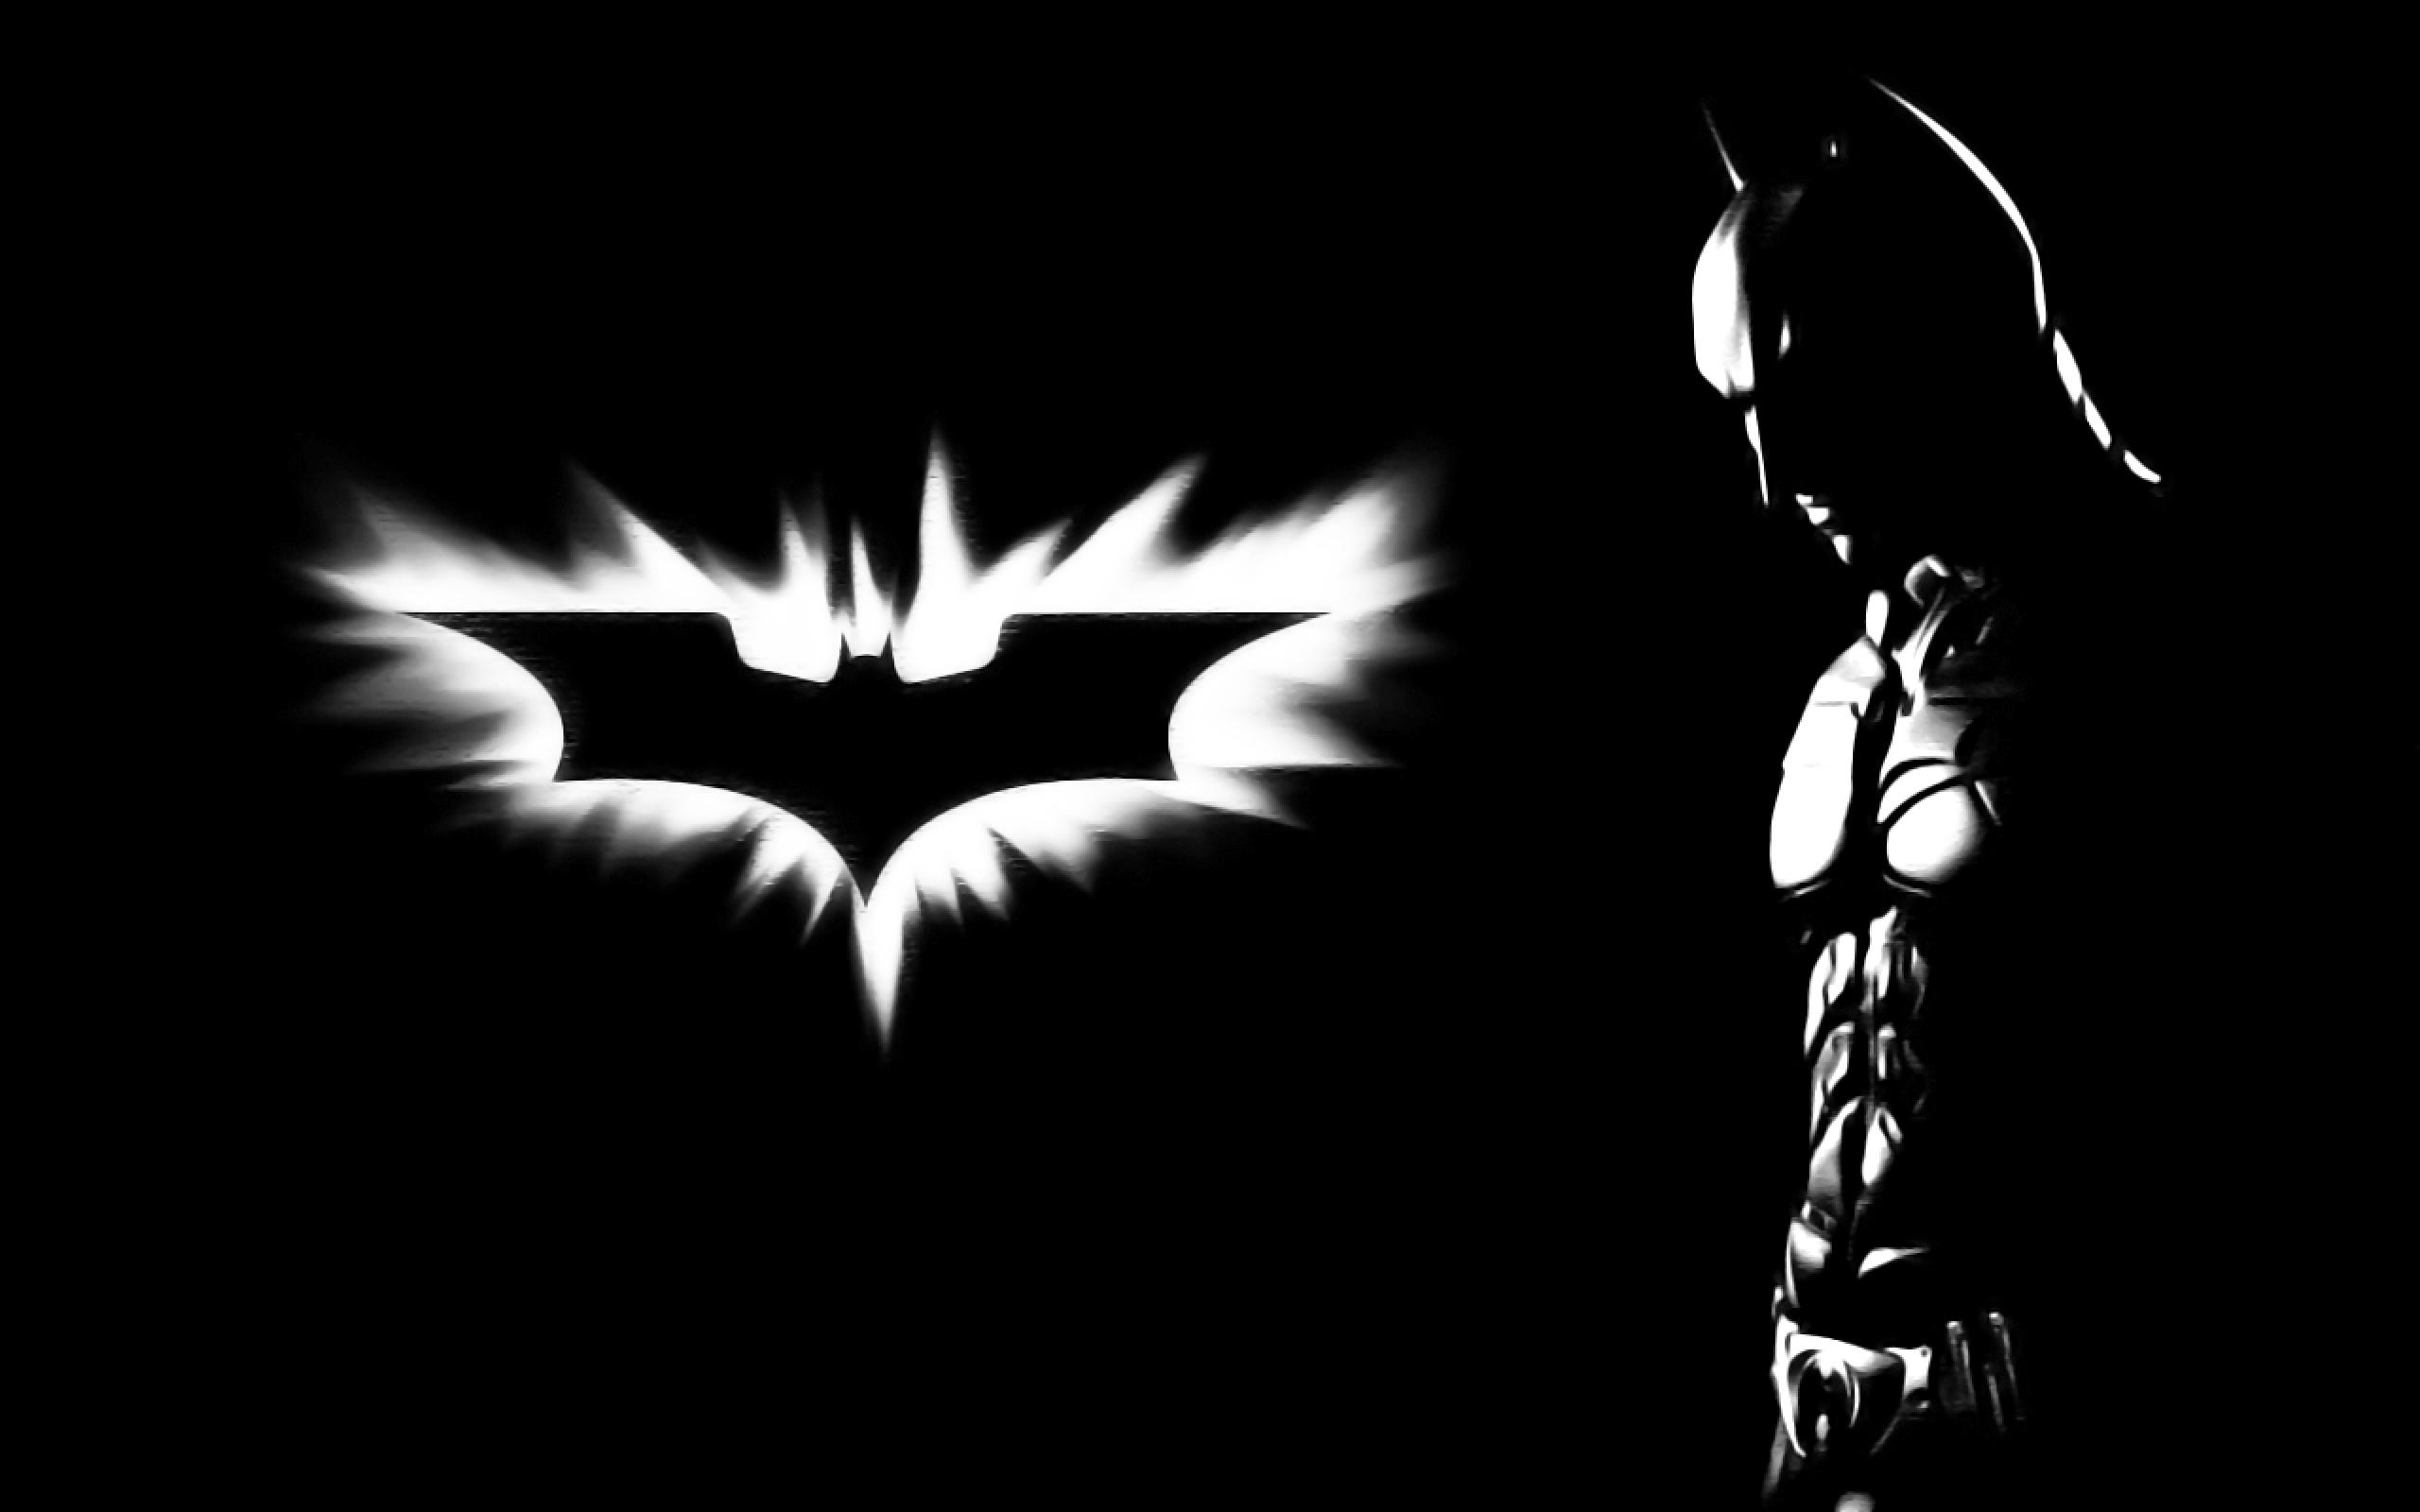 Batman Wallpaper Hd Download Free Pixelstalknet